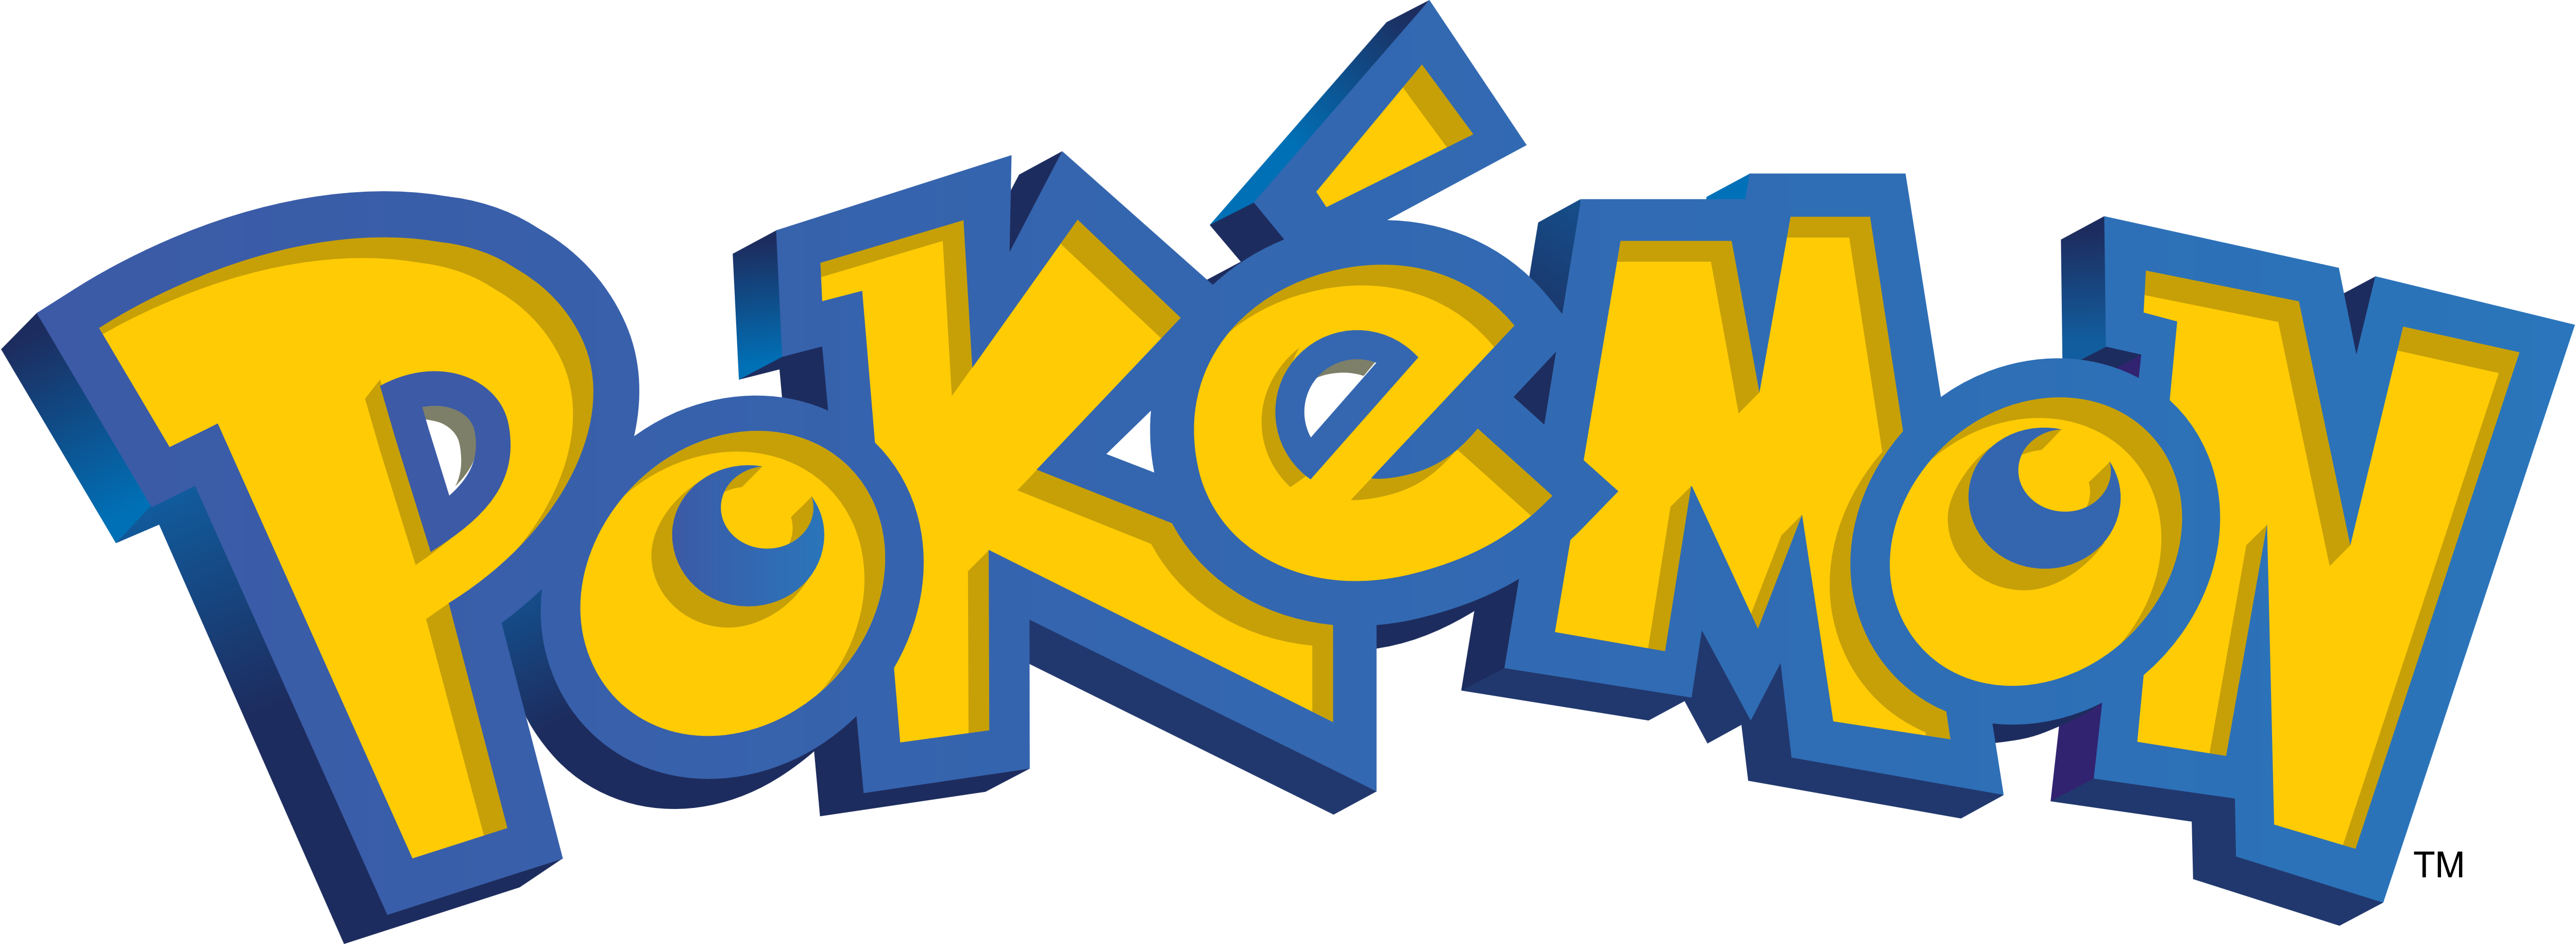 Pokemon logo - Pokemon Go Logo PNG